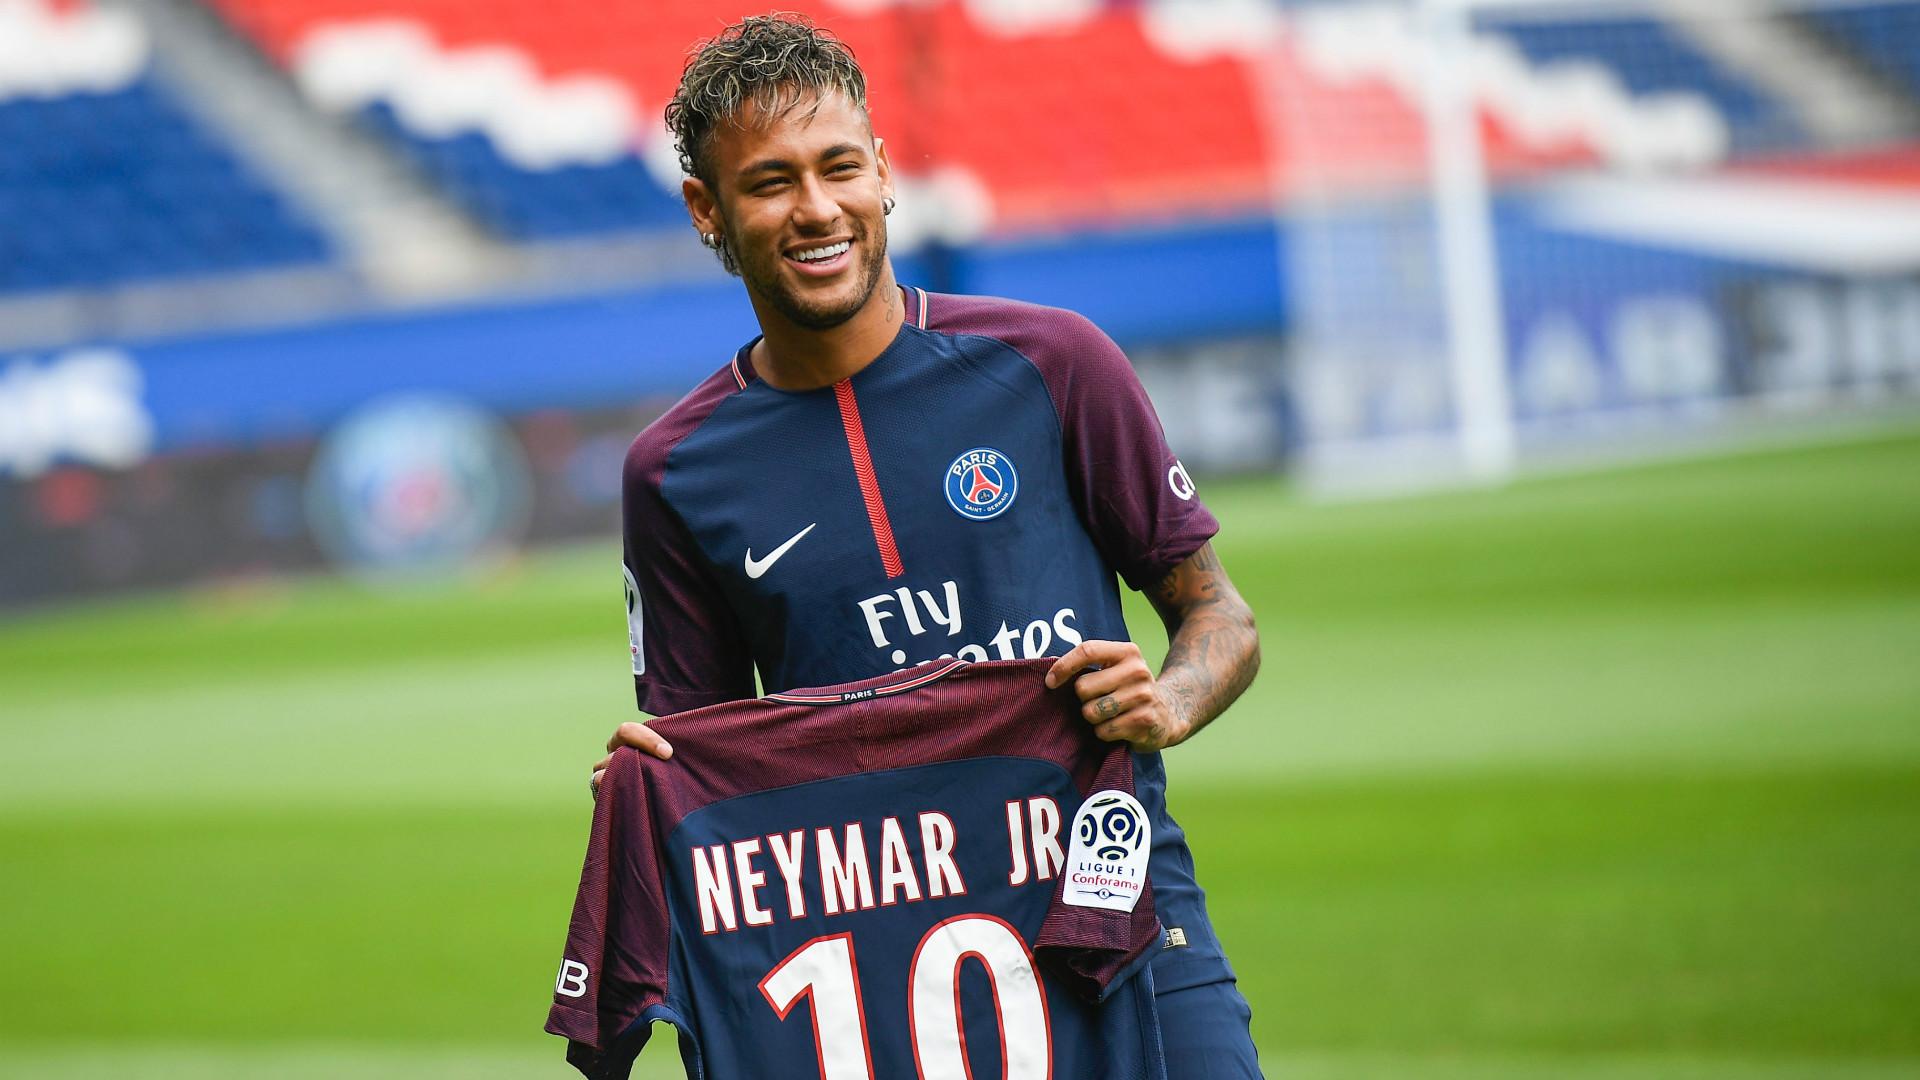 Neymar PSG